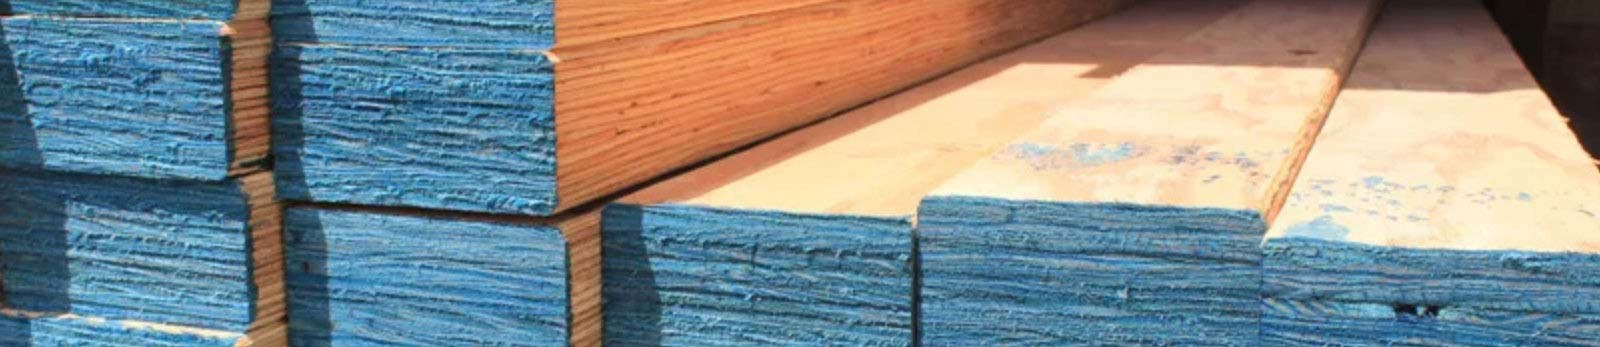 F17 LVL Frame Timber